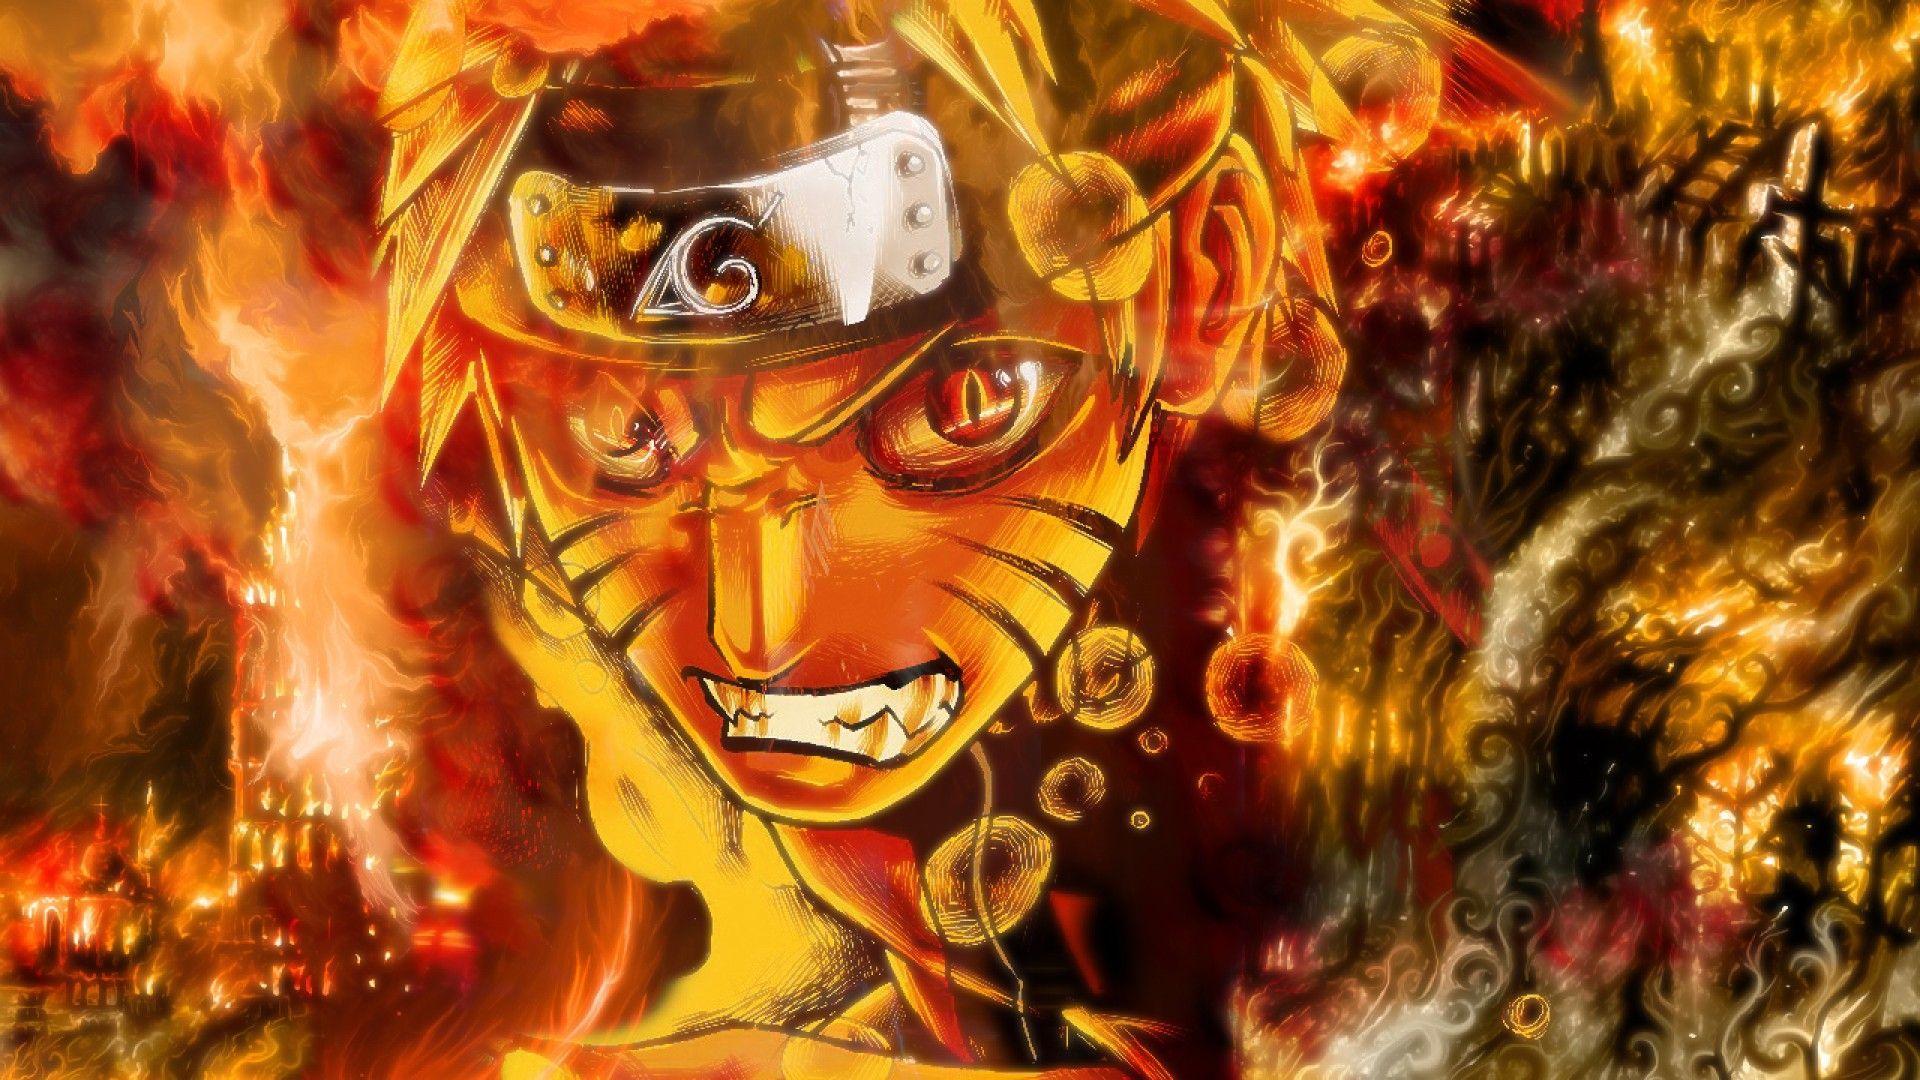 Naruto Shippuden Wallpapers 3d Wallpaper Cave